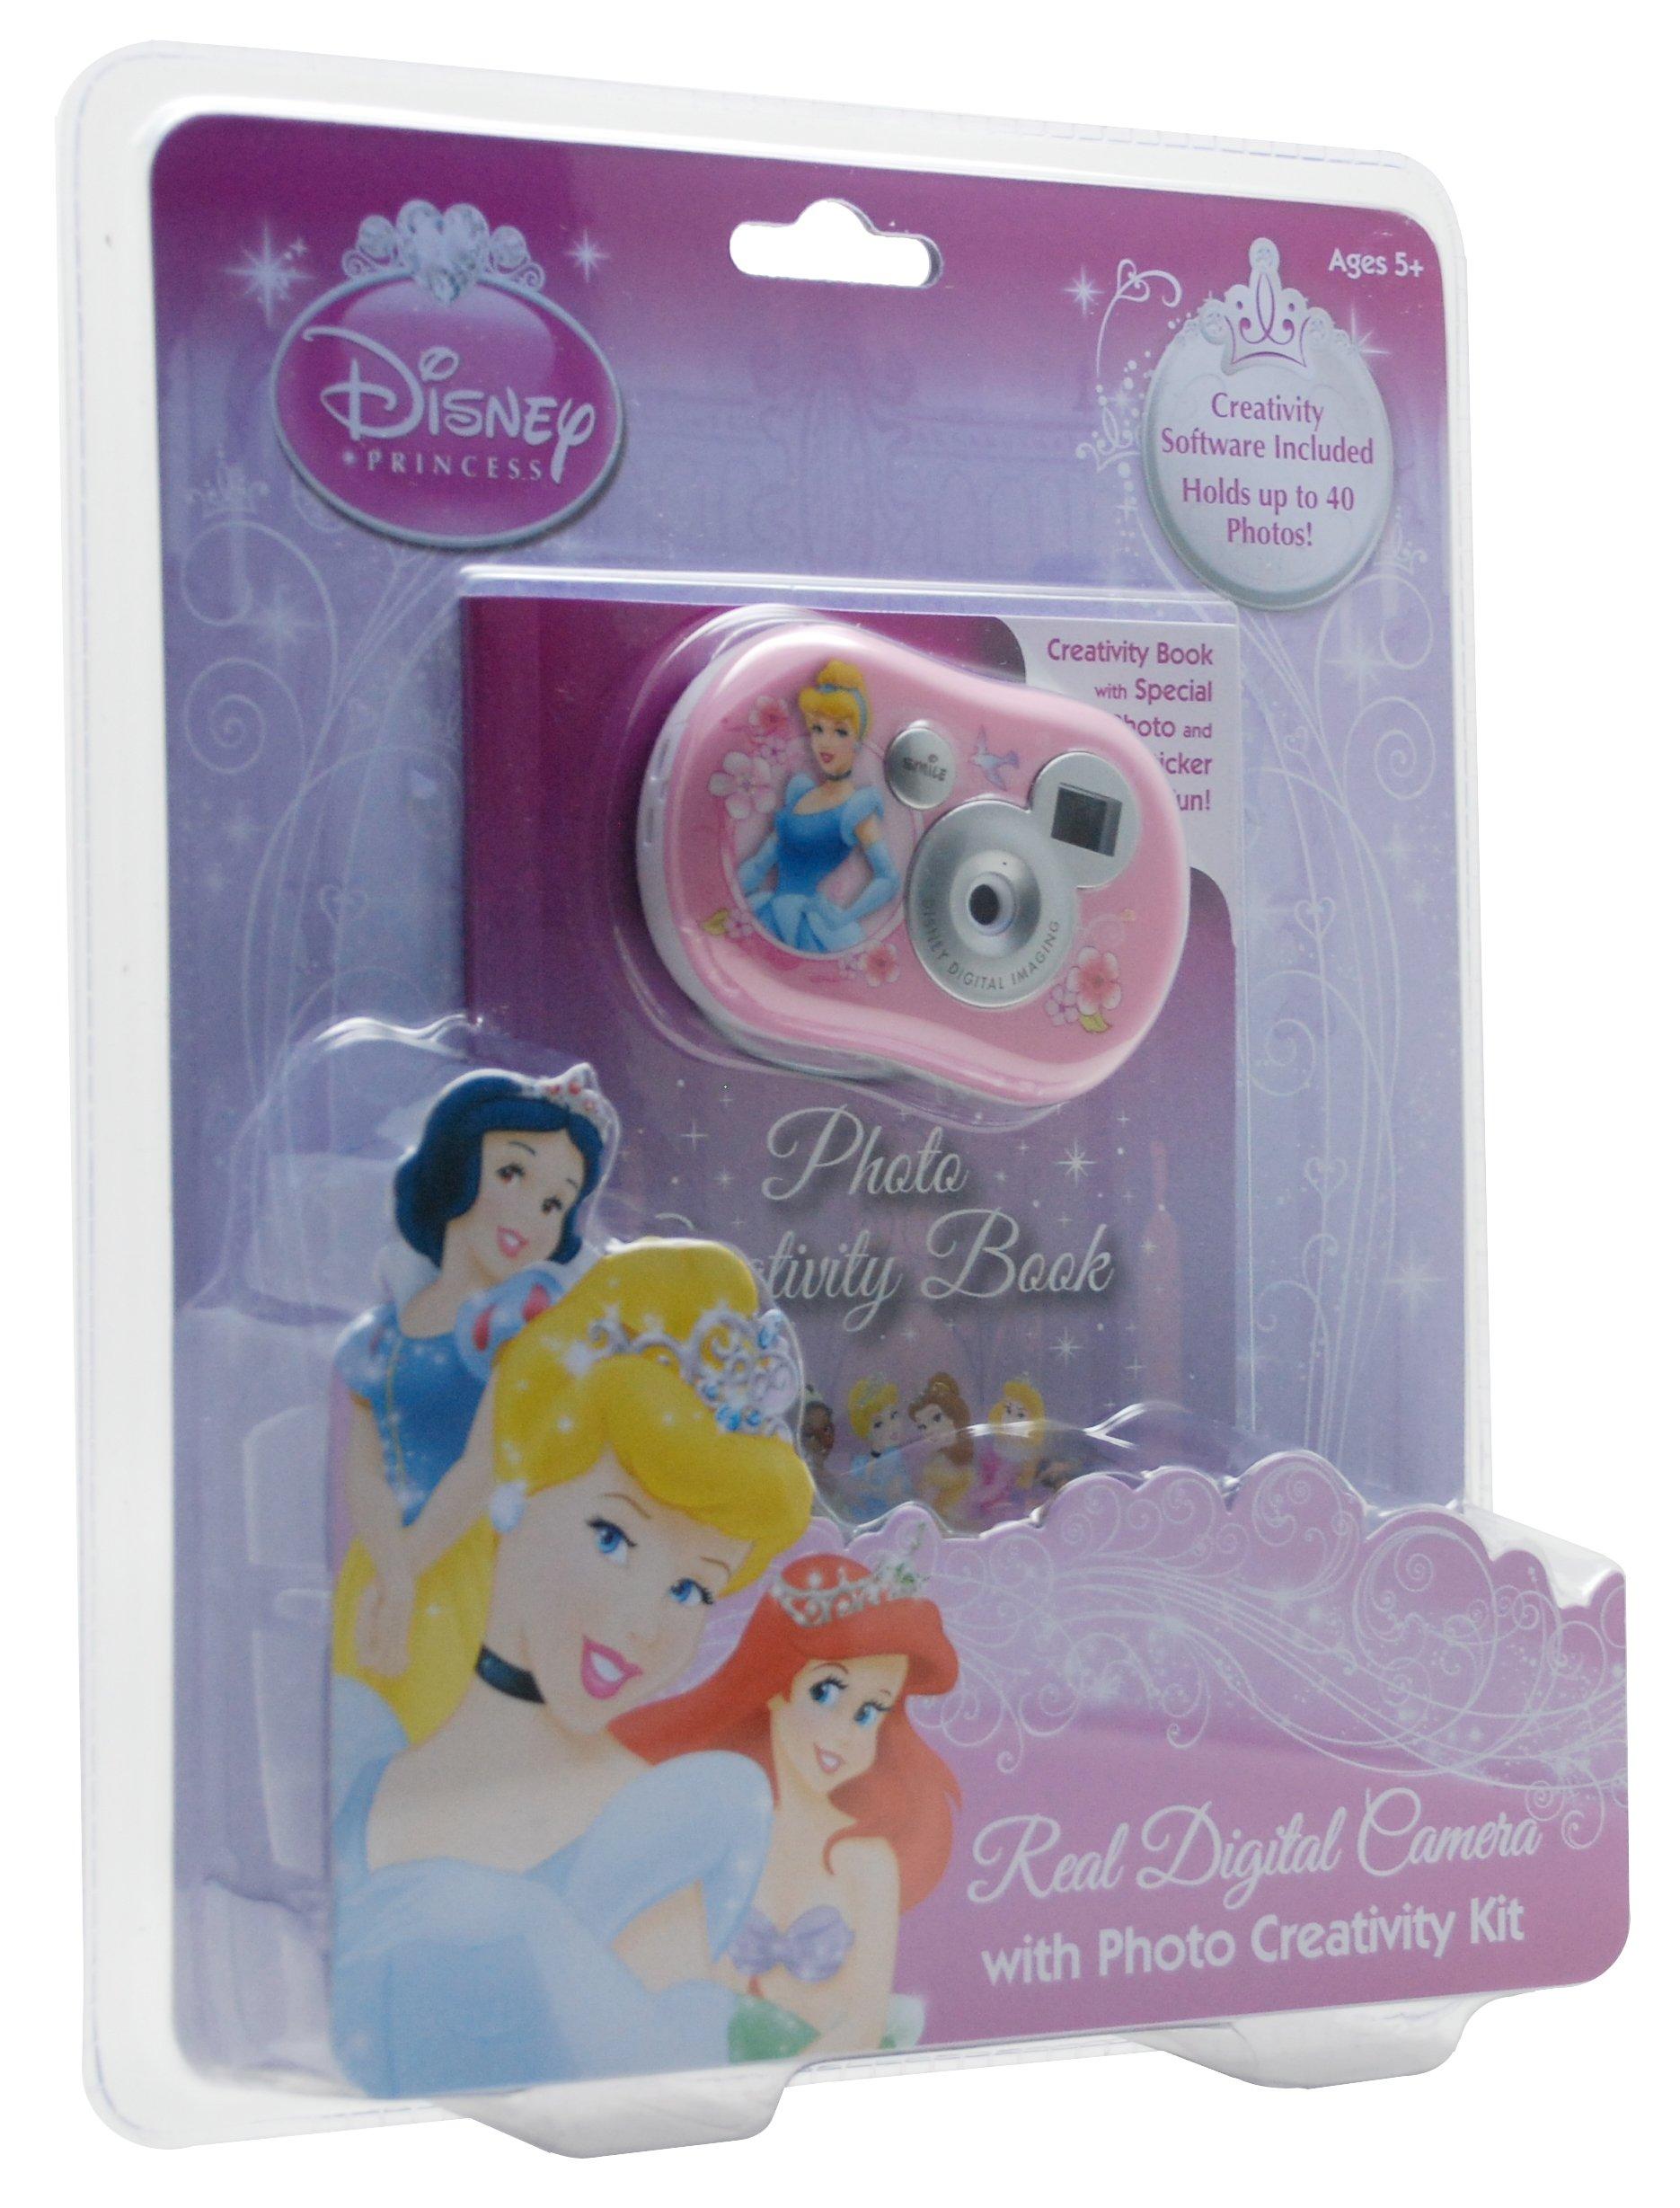 Digital Blue Disney Pix Camera Click Creativity Kit - Disney Princess by Digital Blue (Image #3)